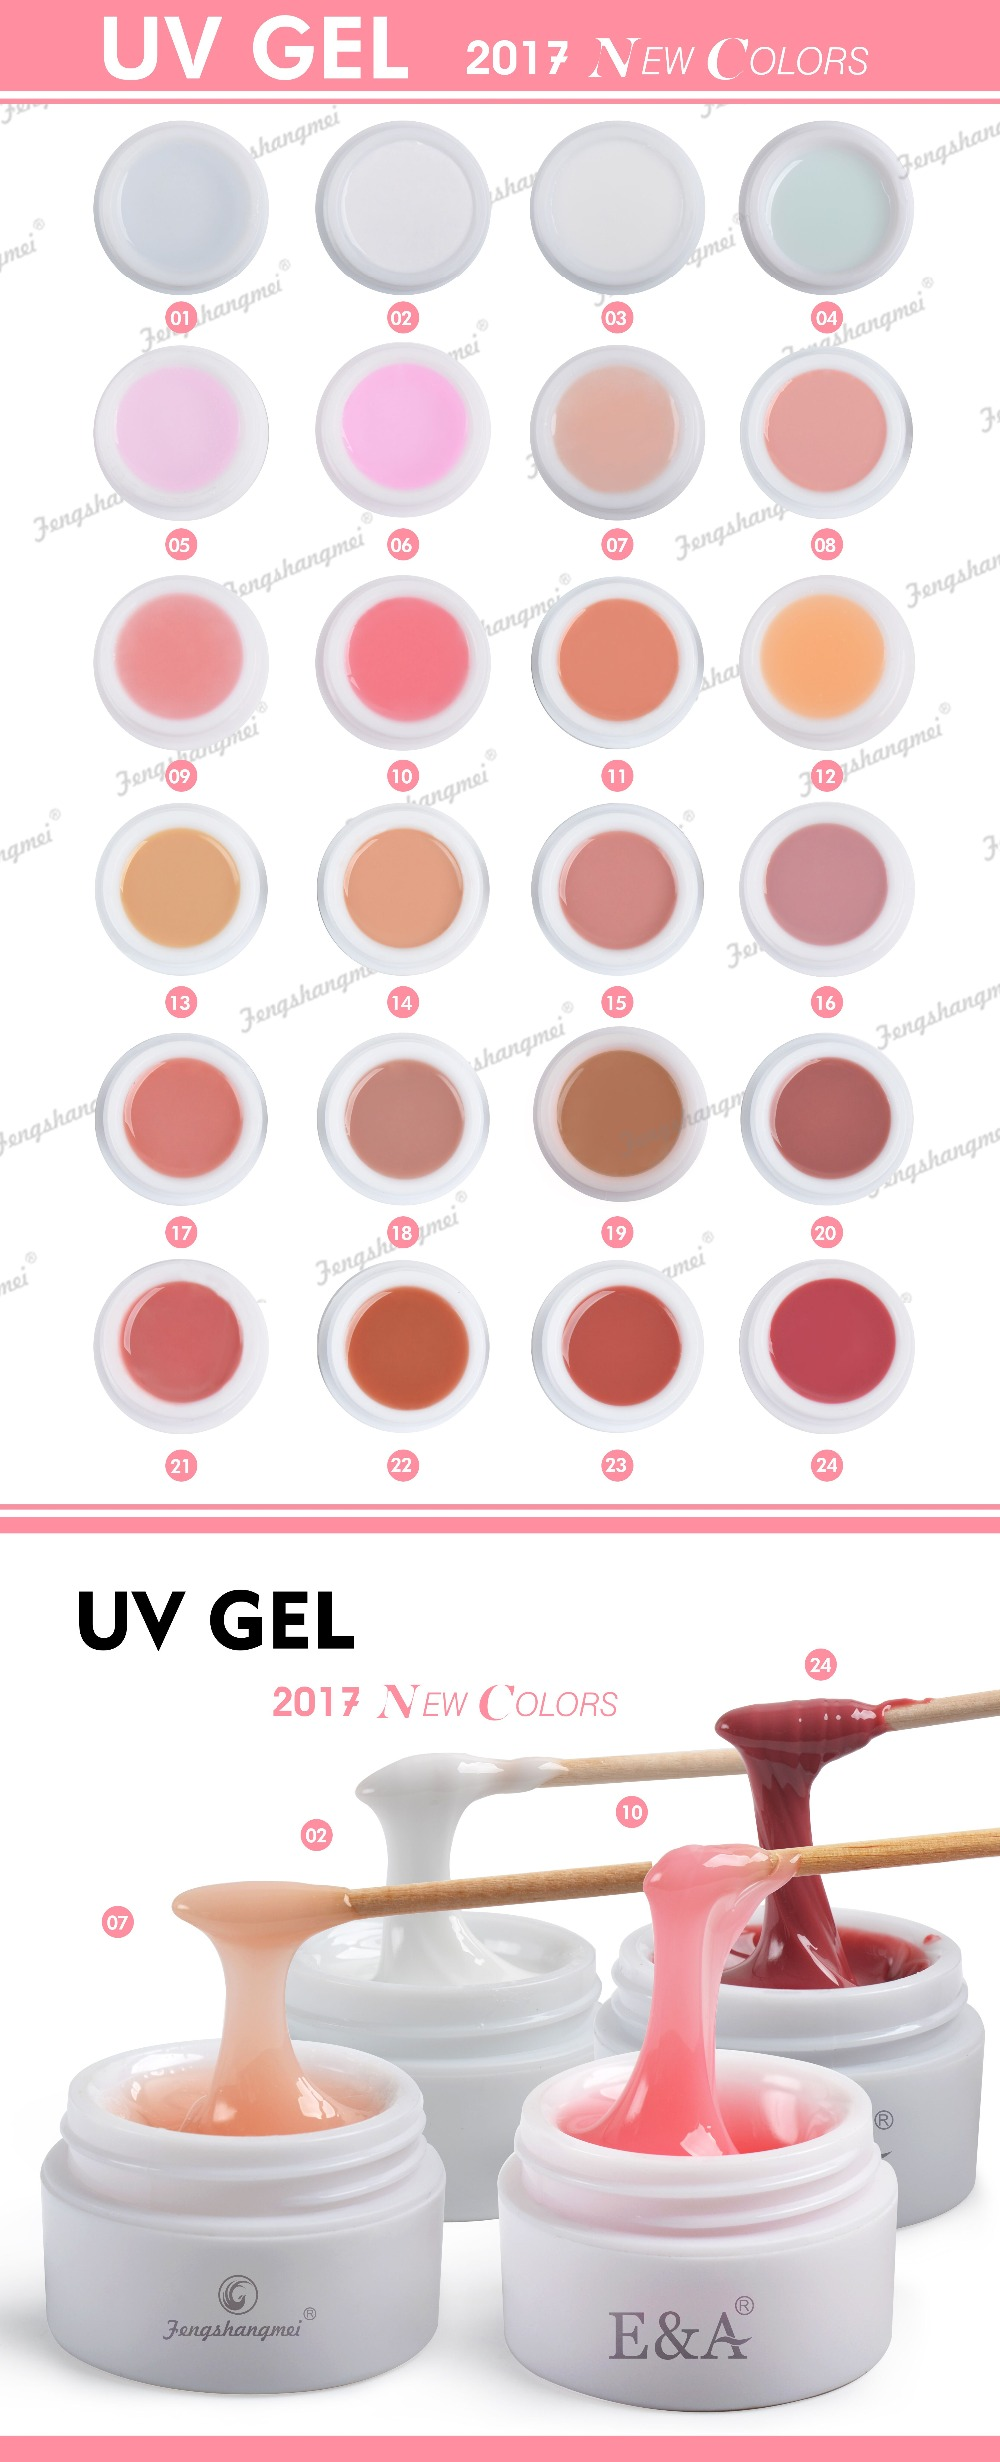 UV gel color chart